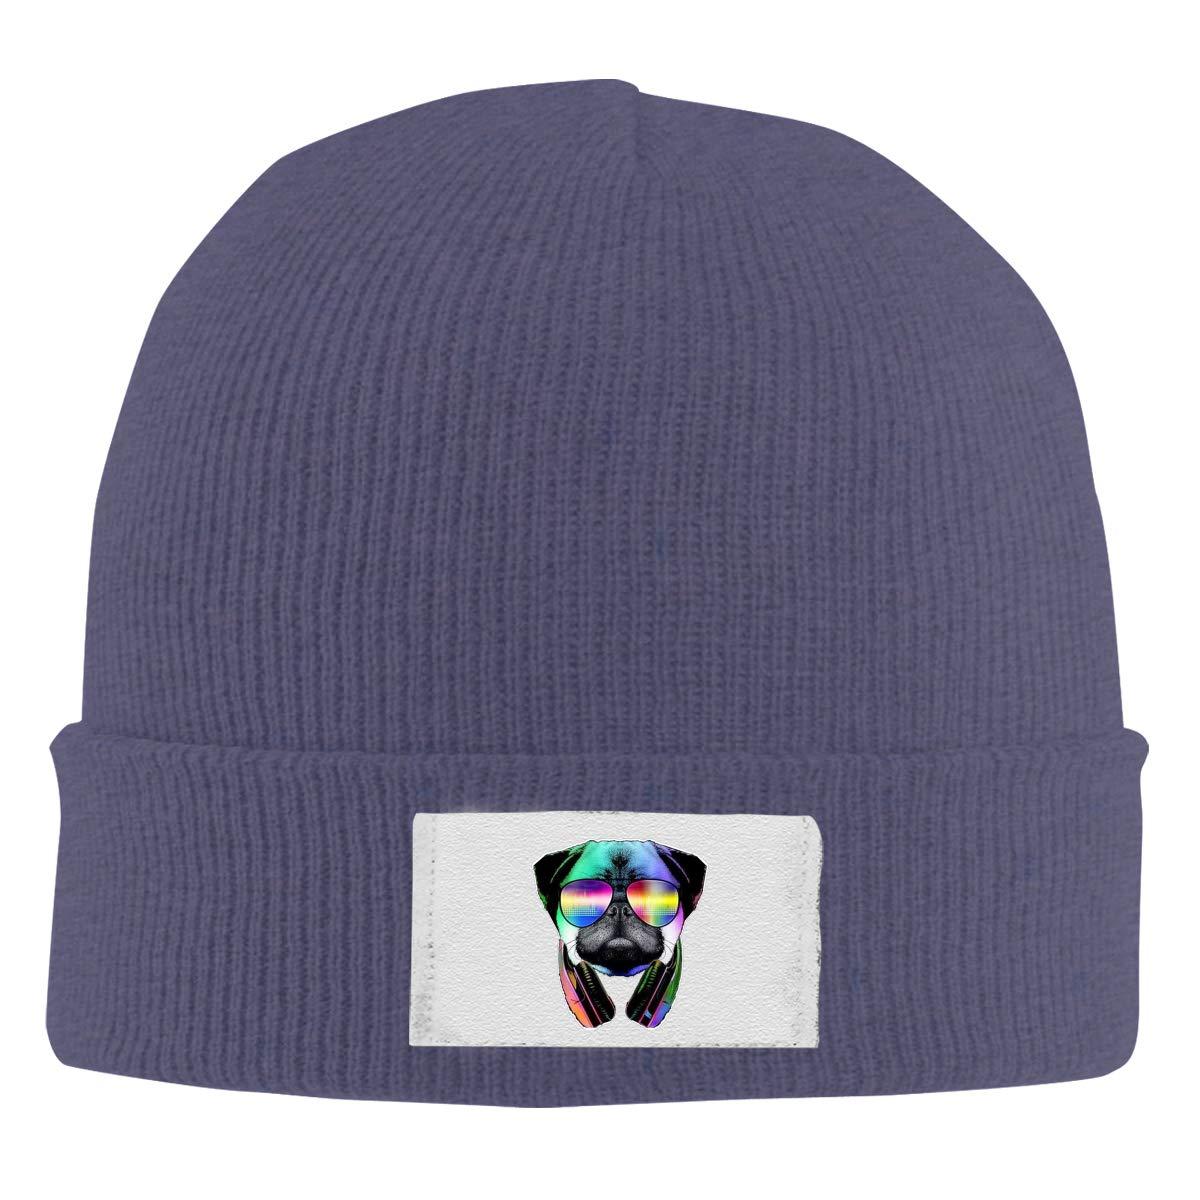 Stretchy Cuff Beanie Hat Black Dunpaiaa Skull Caps 32142037/_394 Winter Warm Knit Hats